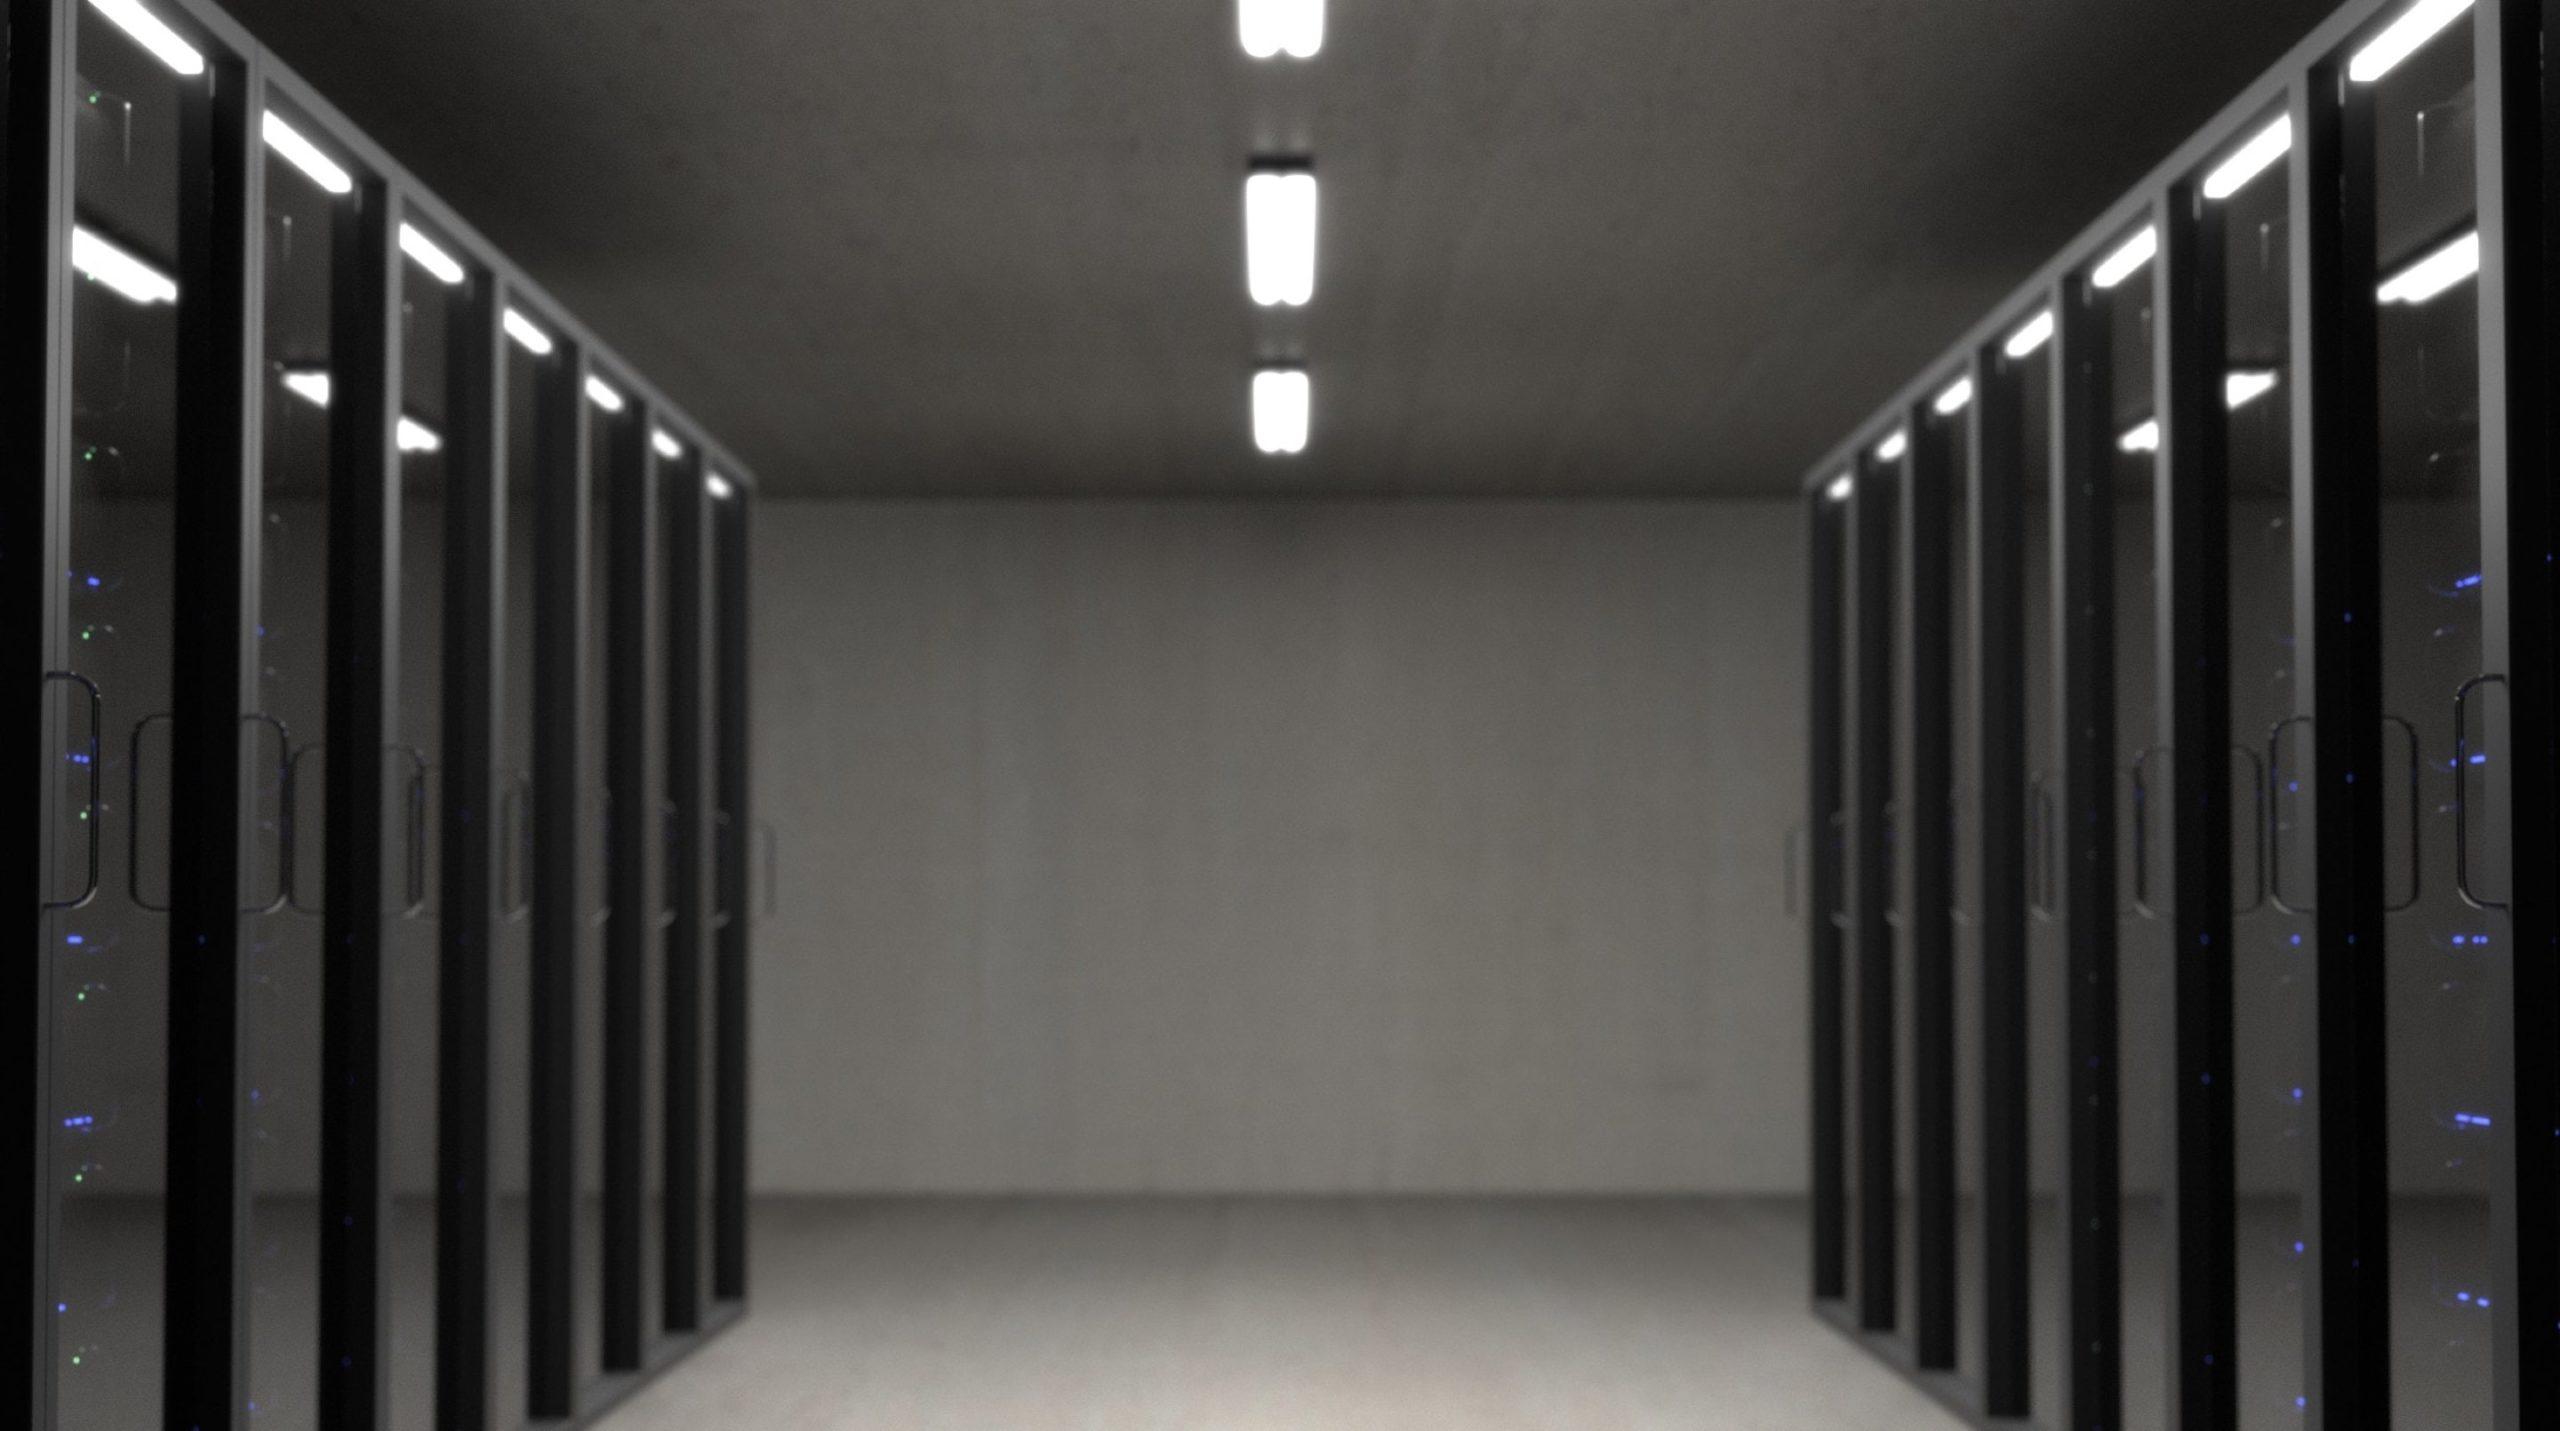 blog-banner-Windows-Azure-and-Java-Working-with-Blob-Storage